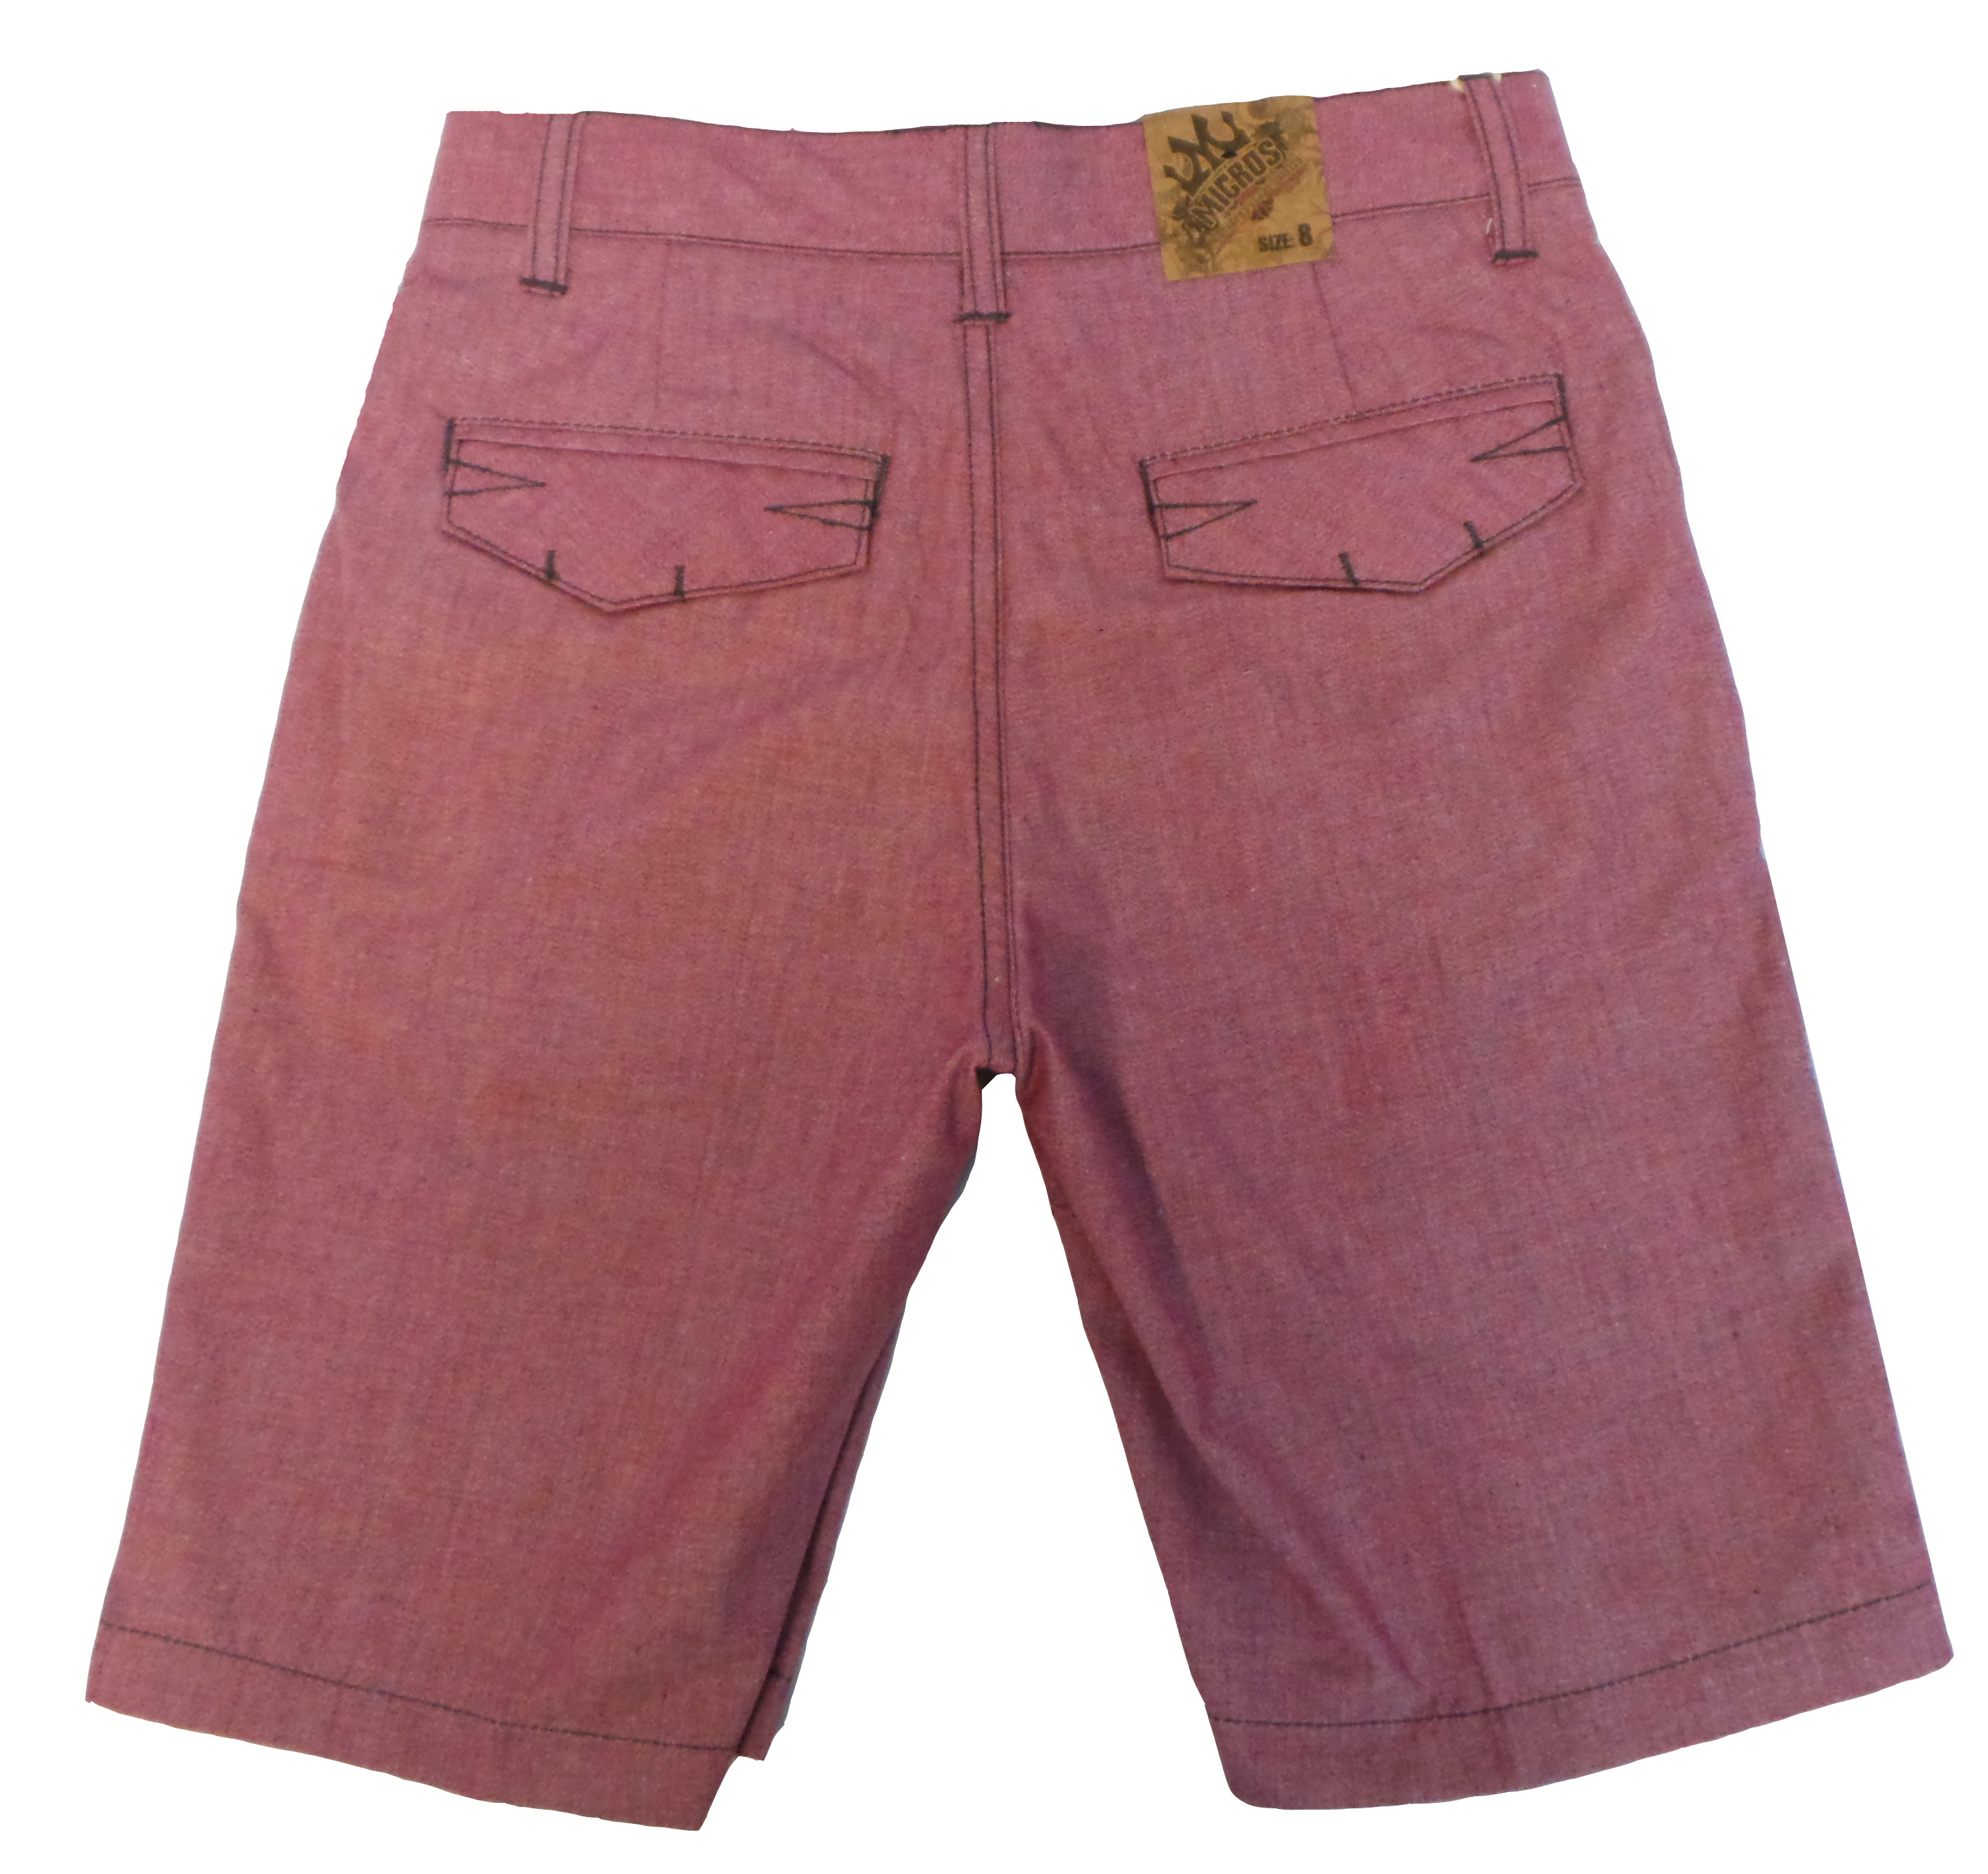 Micros Boys Walk Shorts